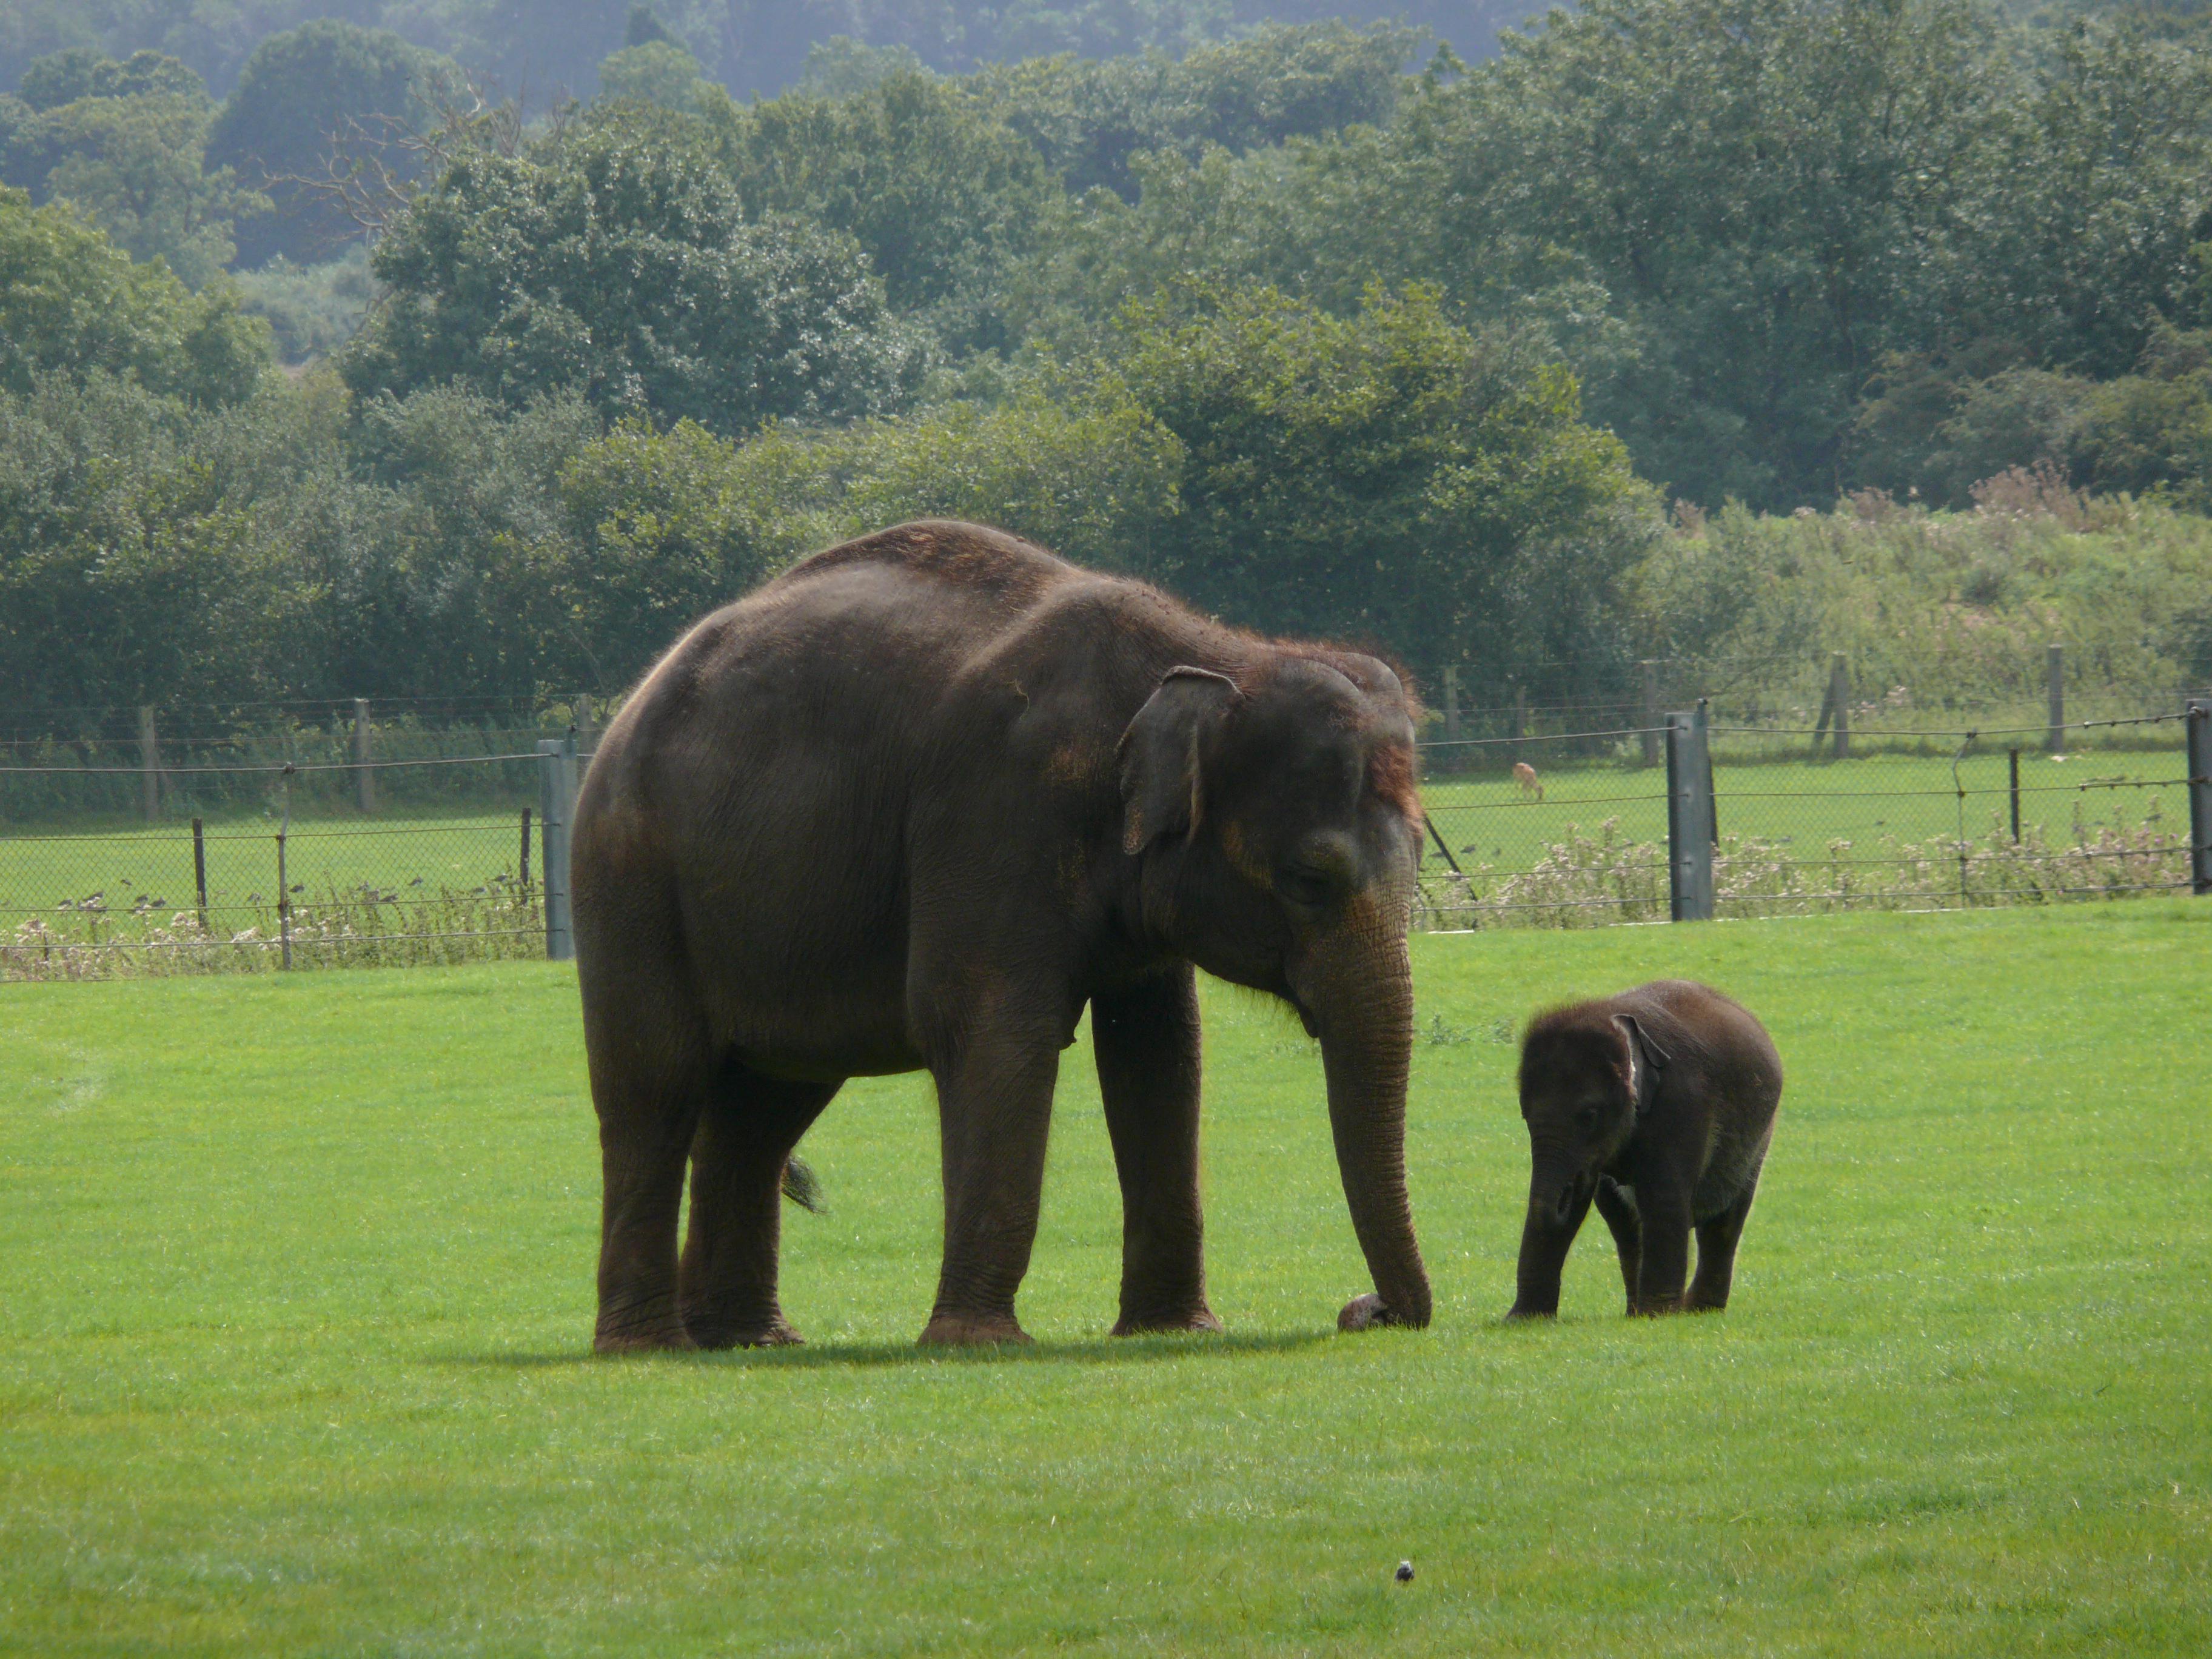 elephants images huge and massive elephant hd wallpaper